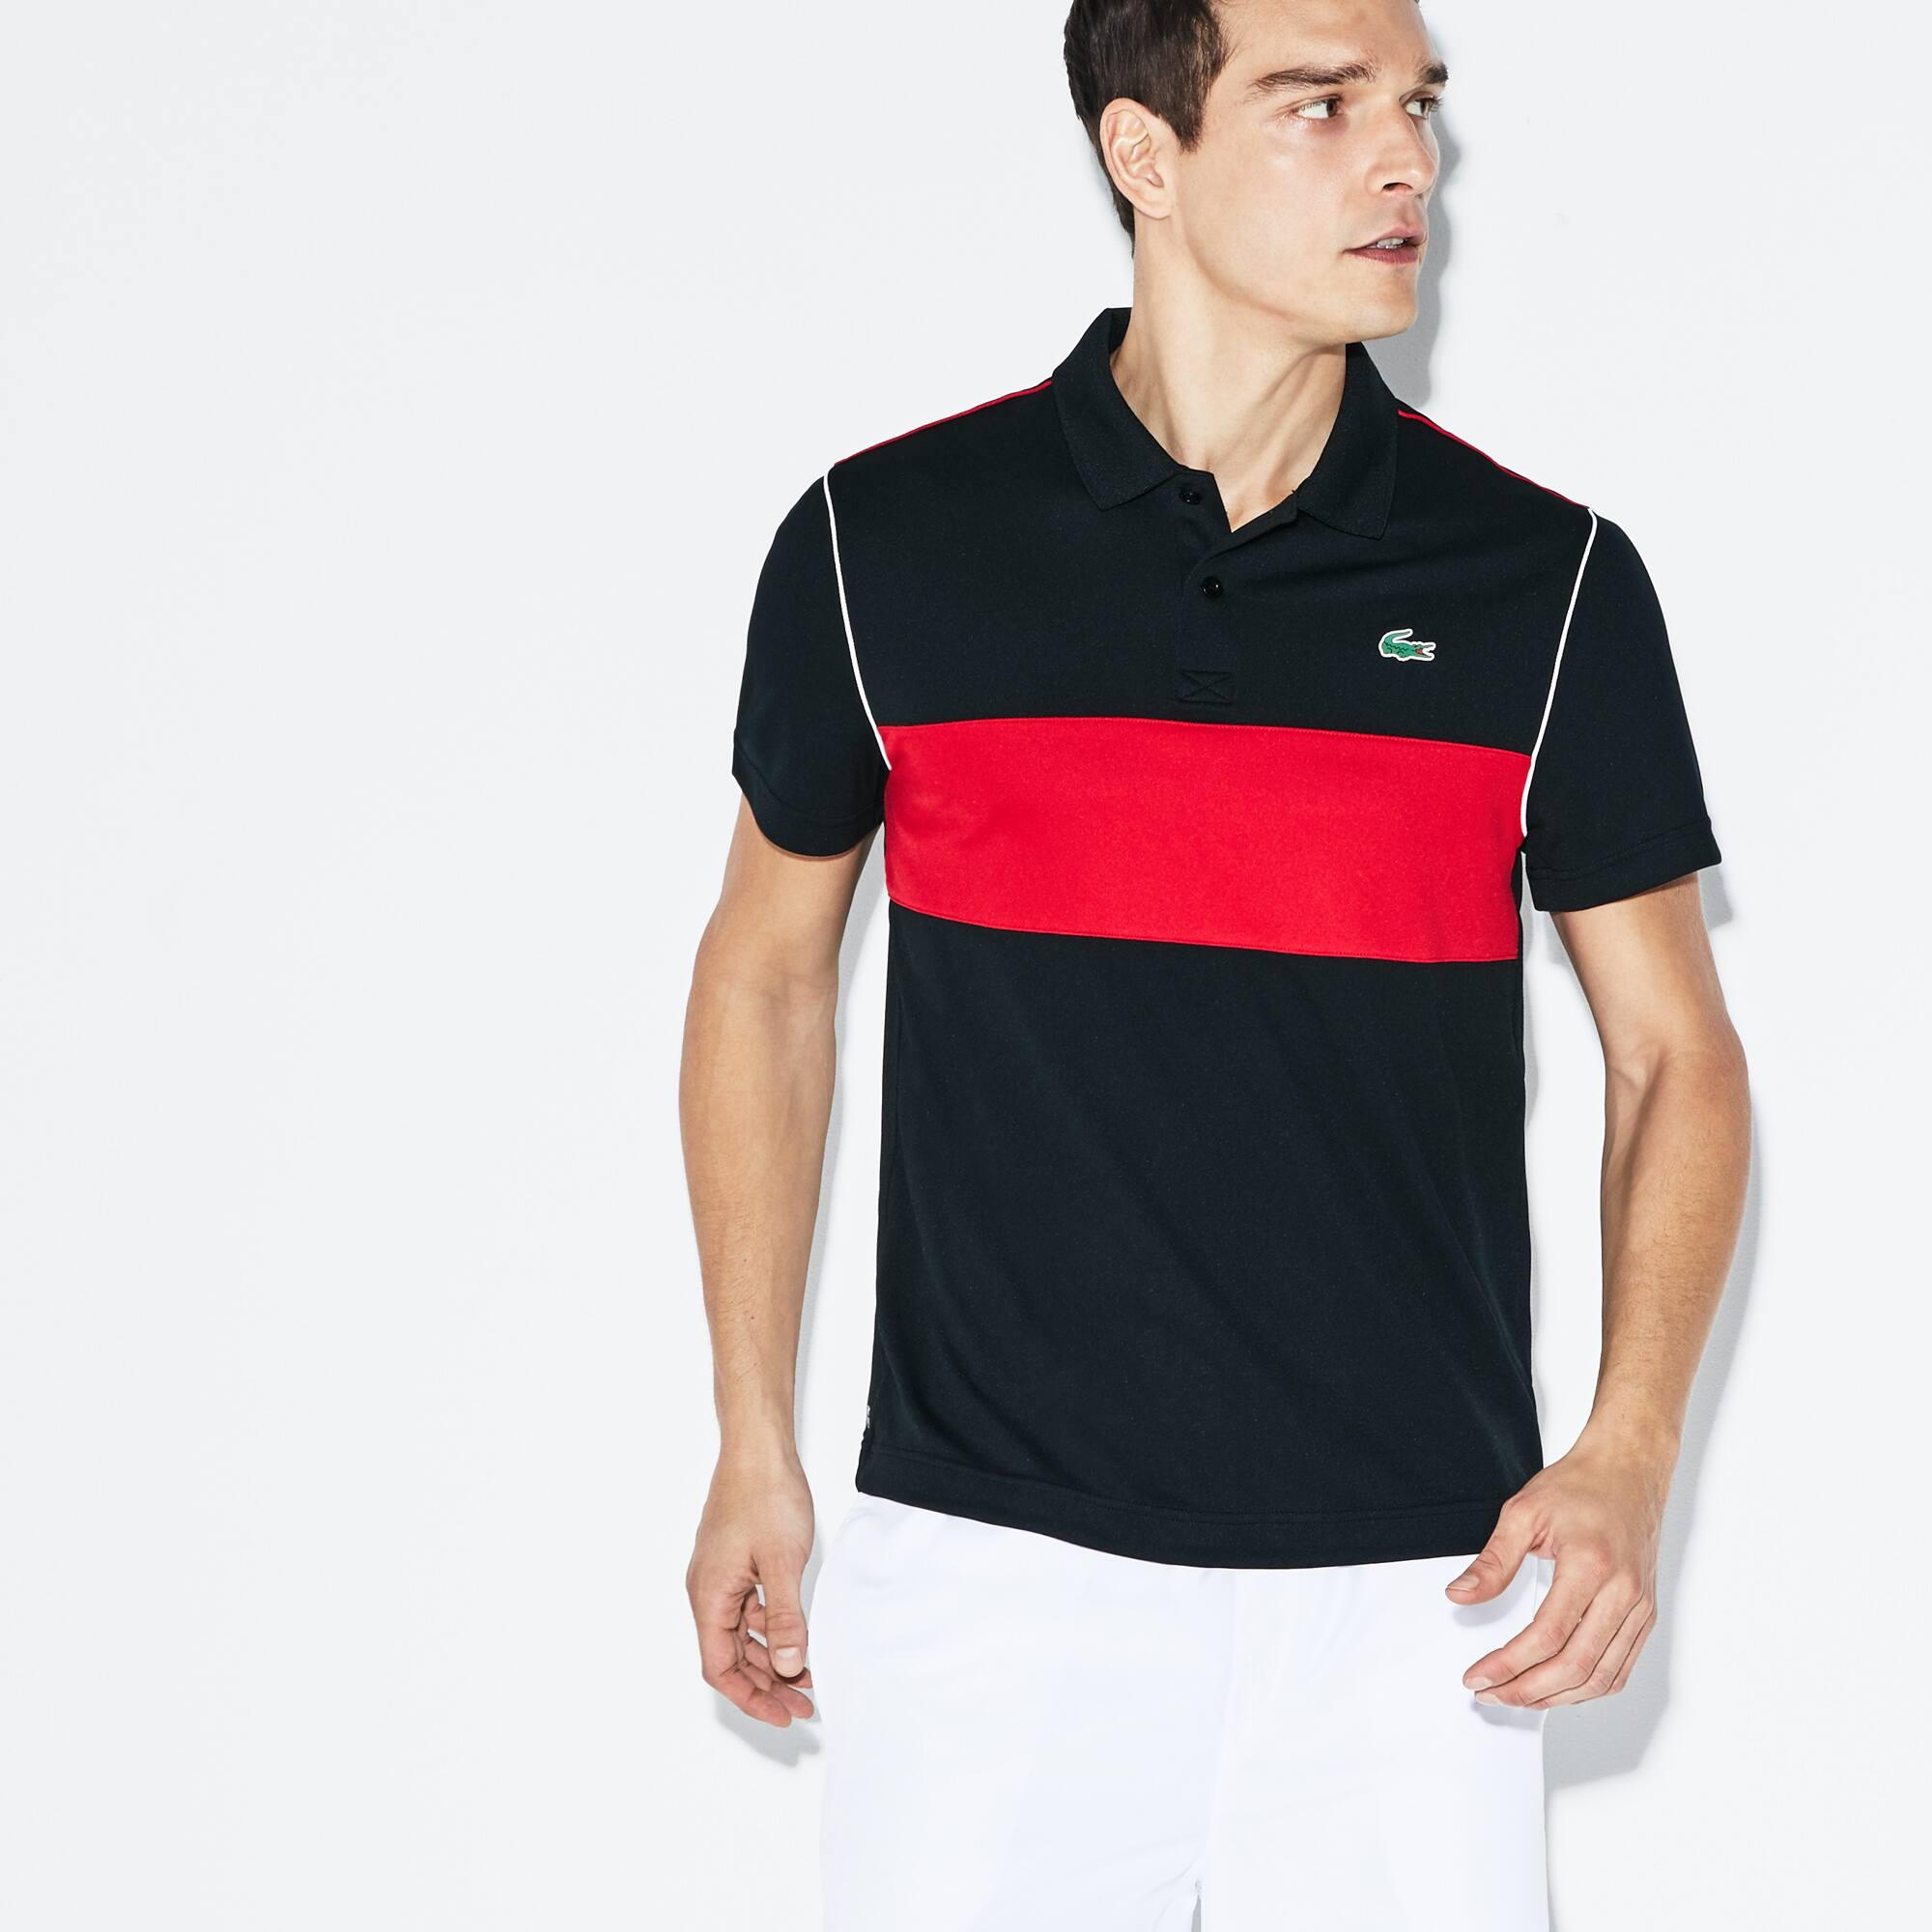 Men's Lacoste SPORT Colorblock Technical Piqué Polo Shirt